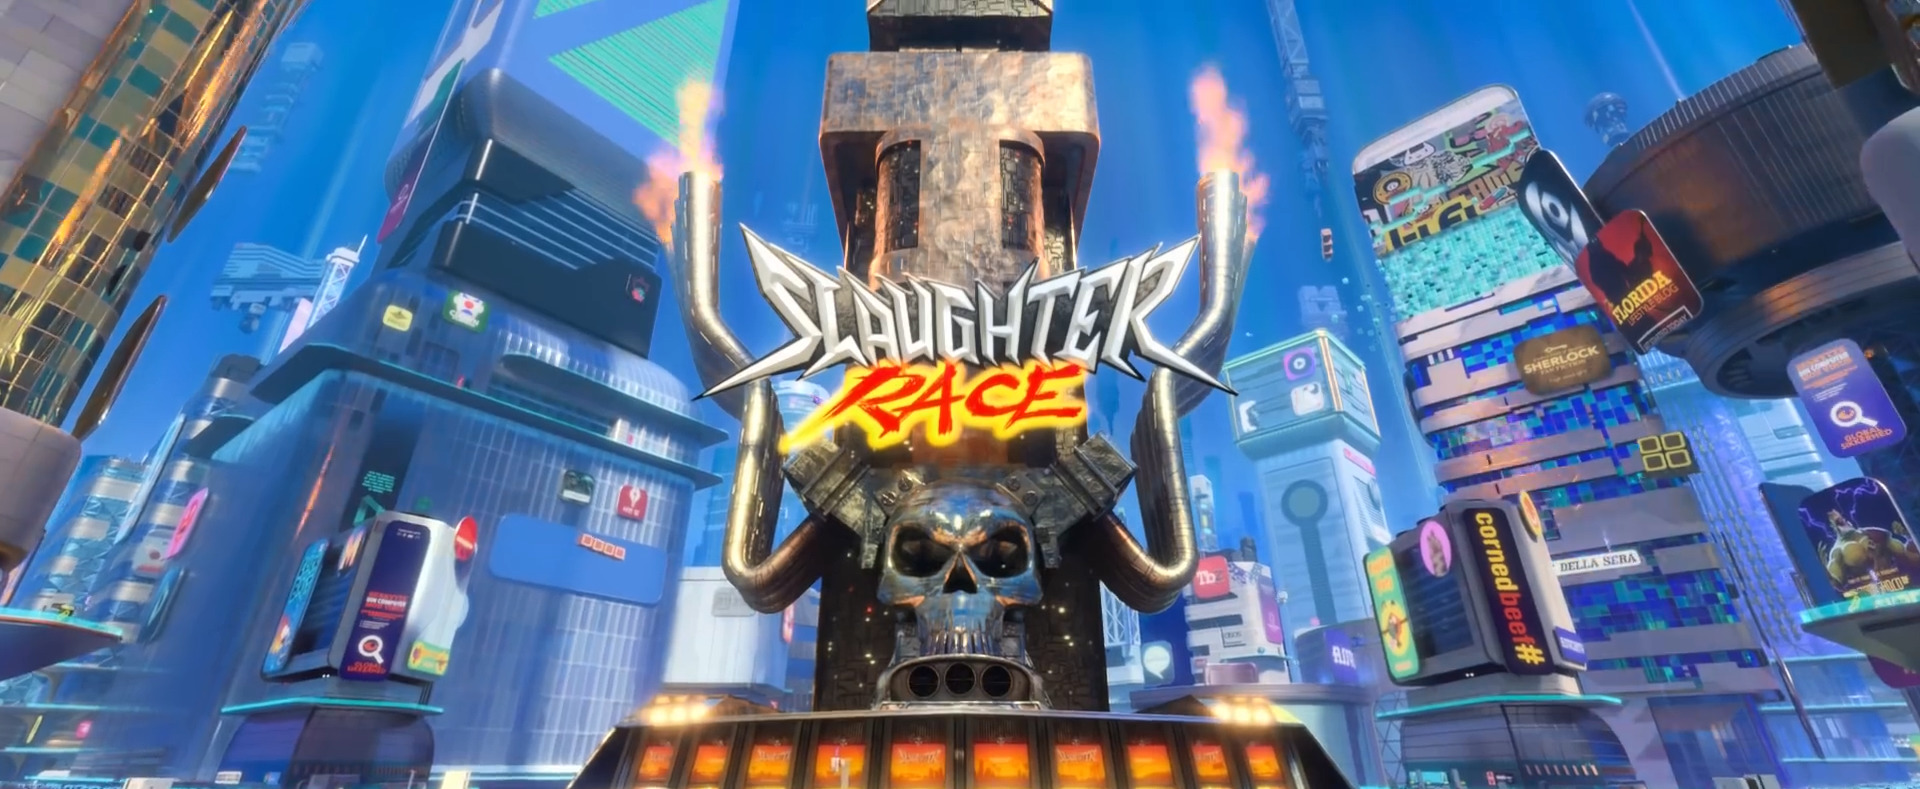 Slaughter Race